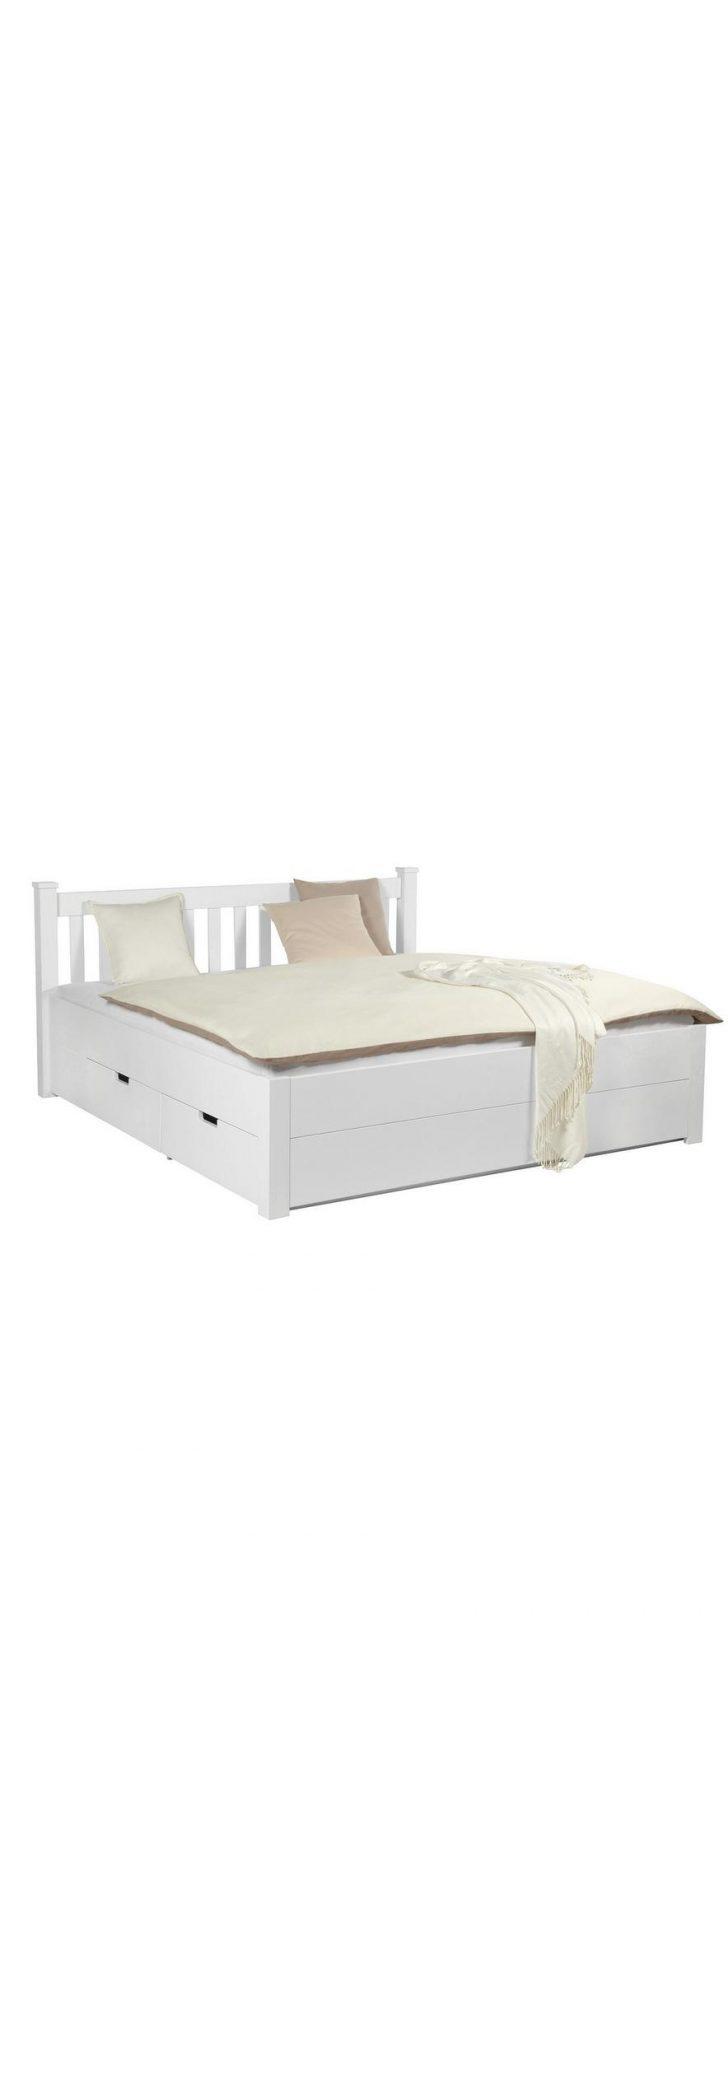 Medium Size of Bett In Wei Ca 140x200cm Online Kaufen Mmax Wasser Feng Shui Altes Komplett Leander Luxus Betten Ikea 160x200 Clinique Even Better Foundation Sonoma Eiche Bett Bett Weiss